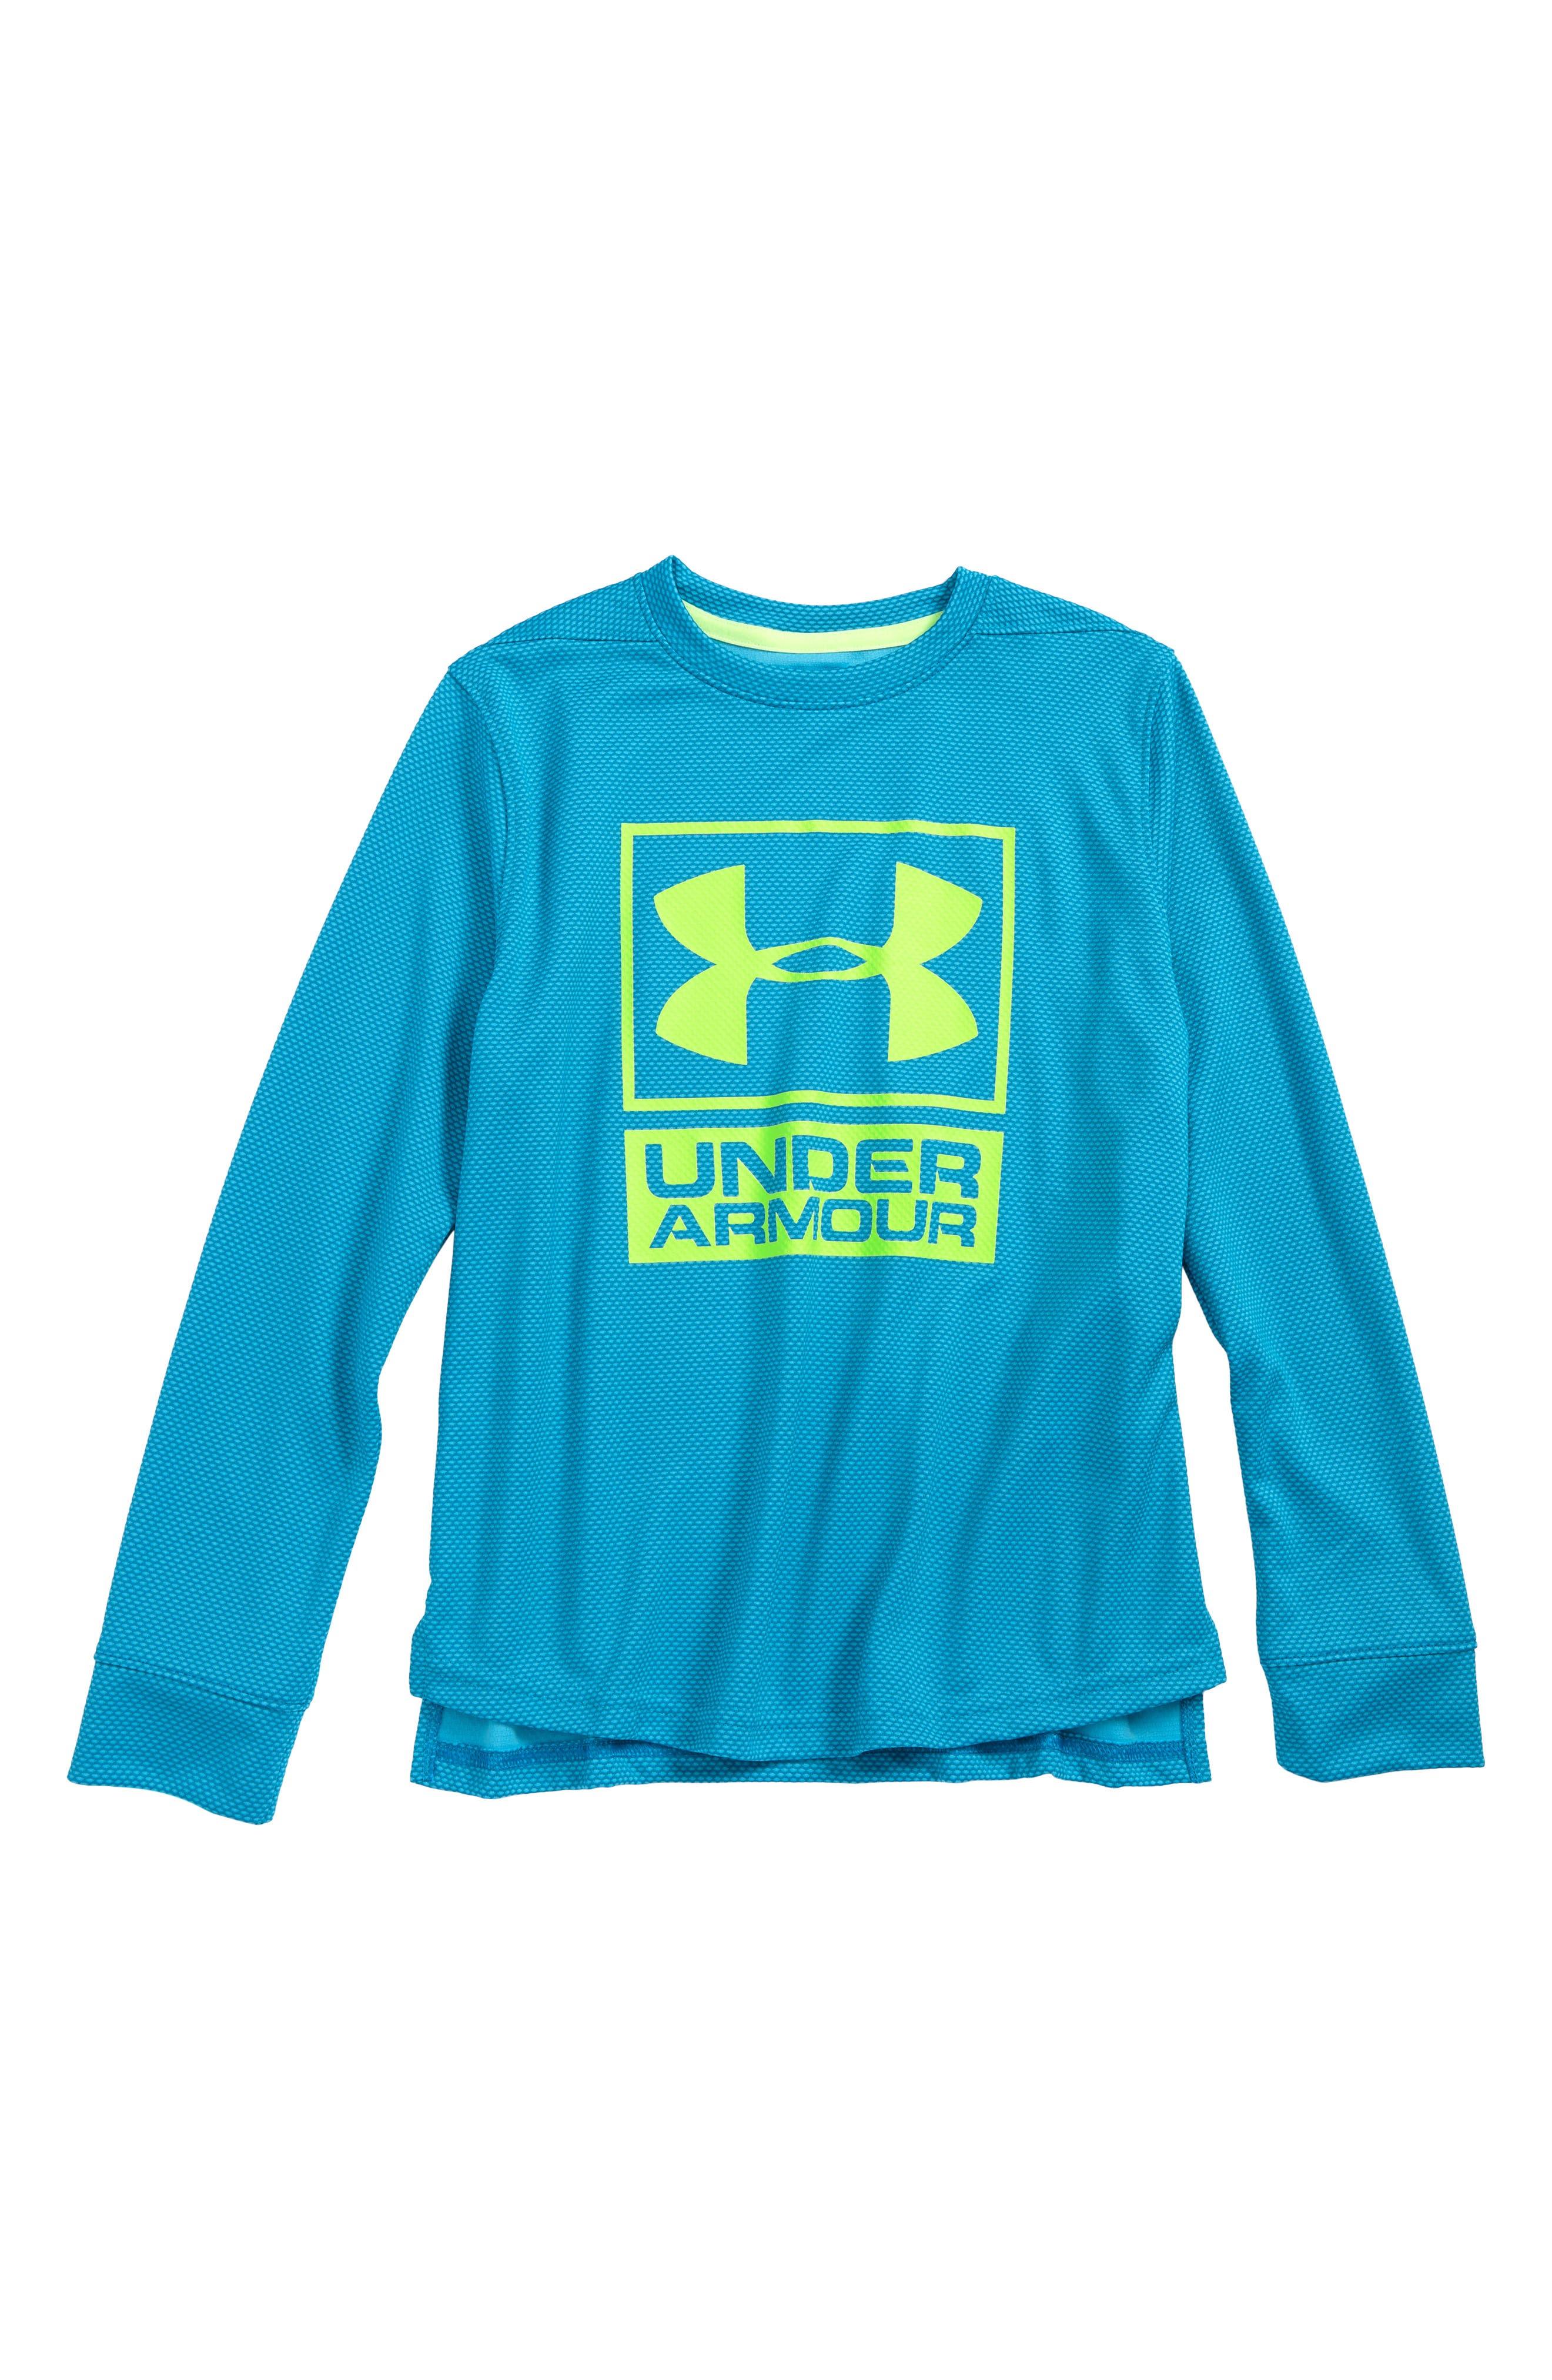 Logo Tech Shirt,                         Main,                         color, Cruise Blue/ Quirky Lime